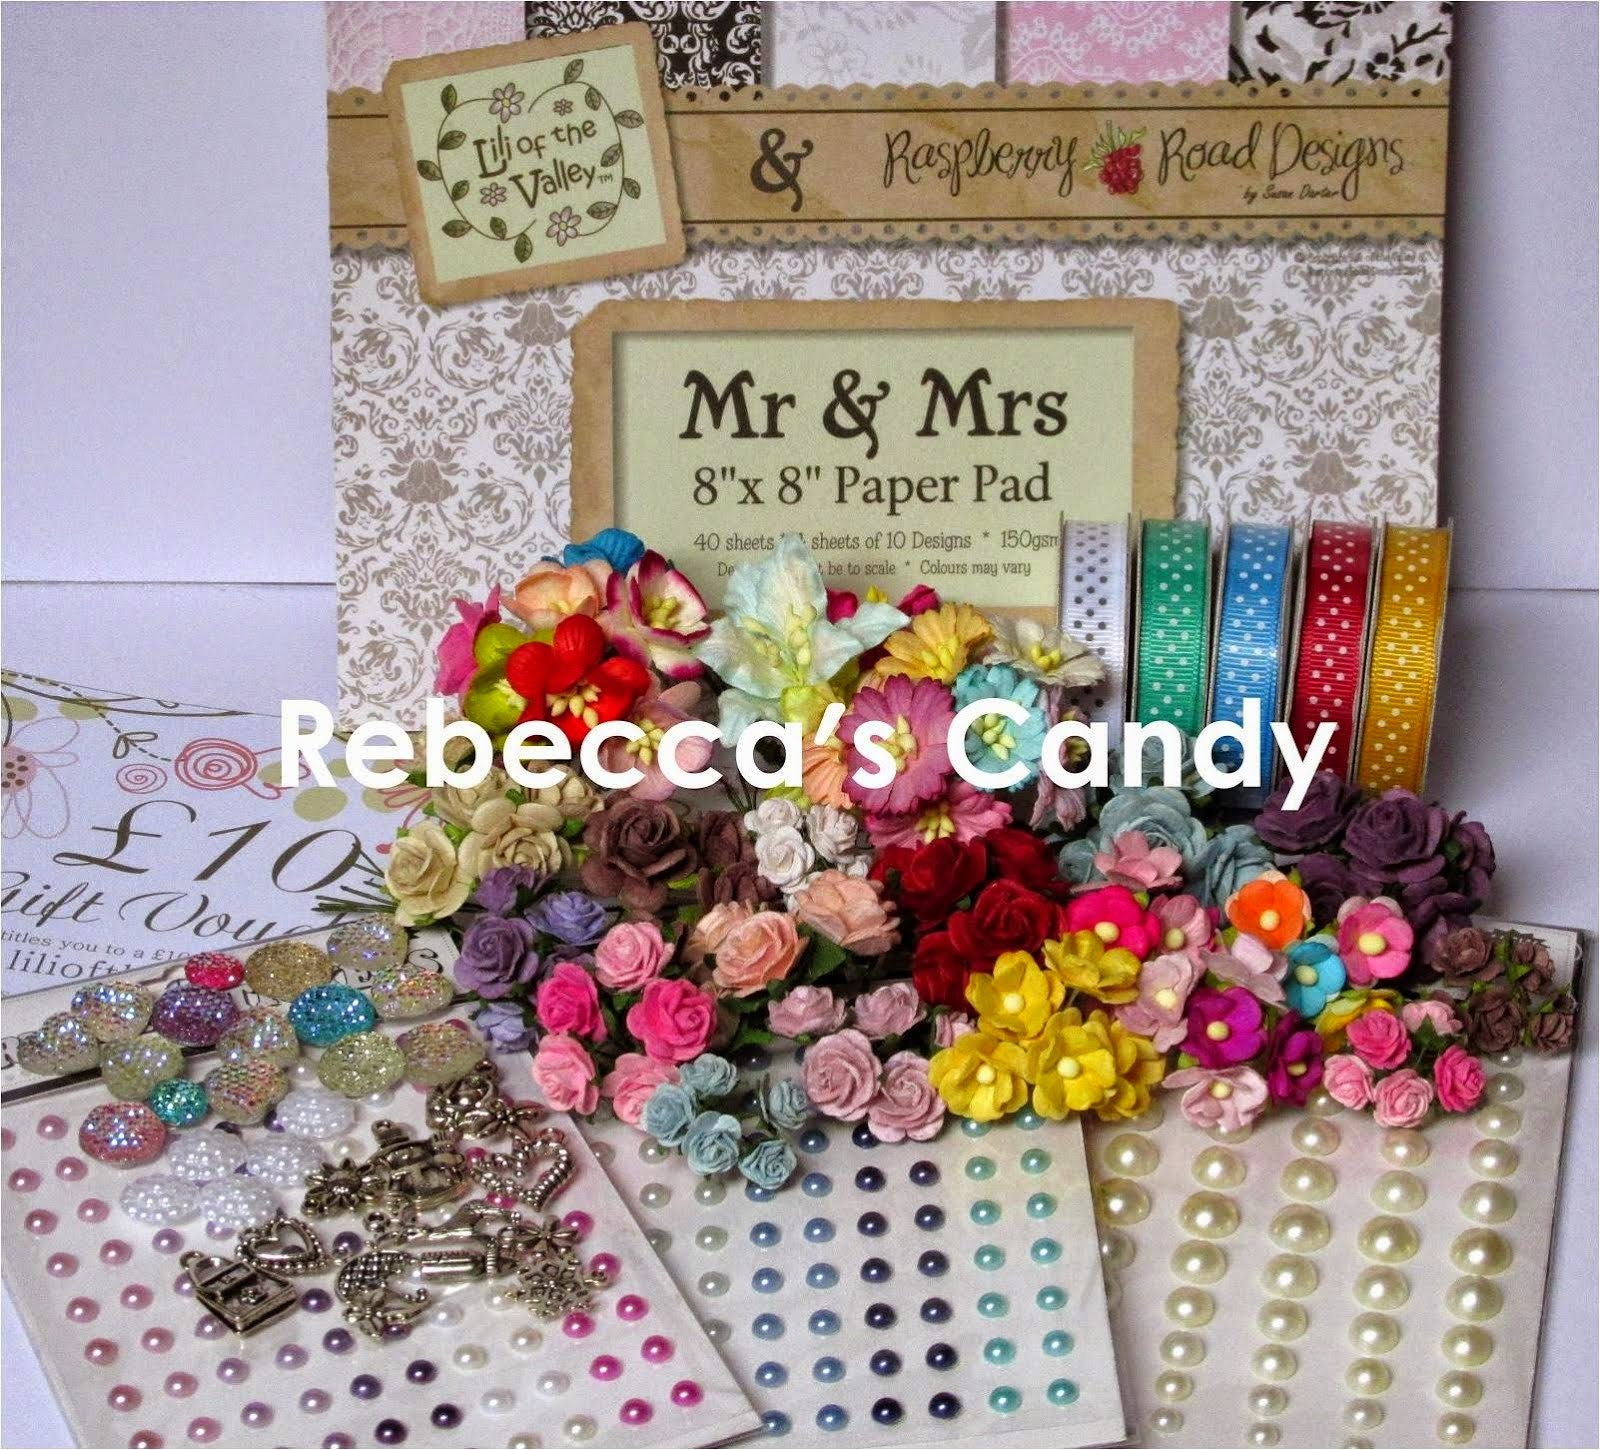 Rebecca's Blog Candy